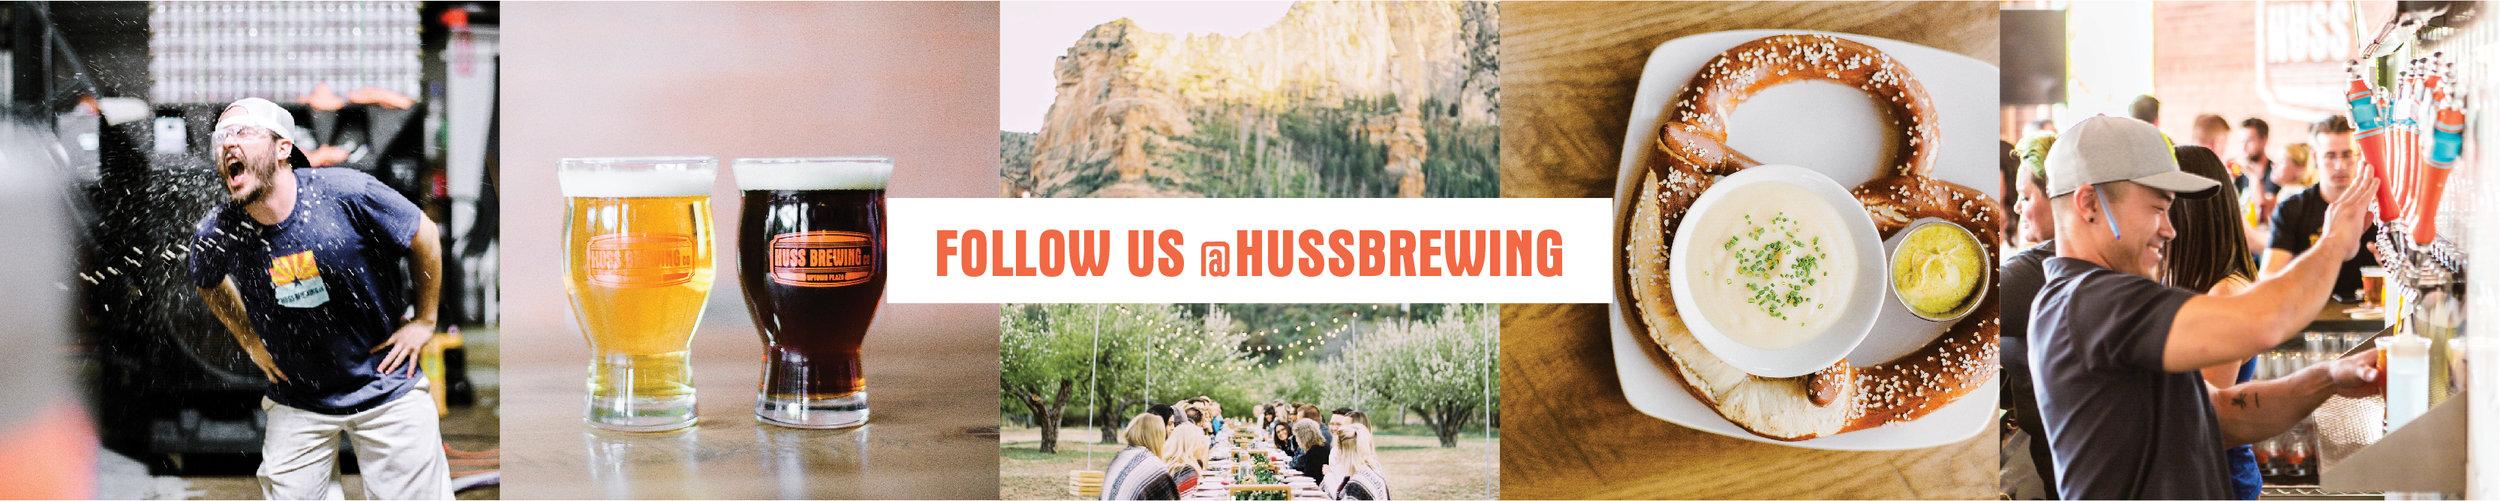 Huss Website IG Collage-09.jpg